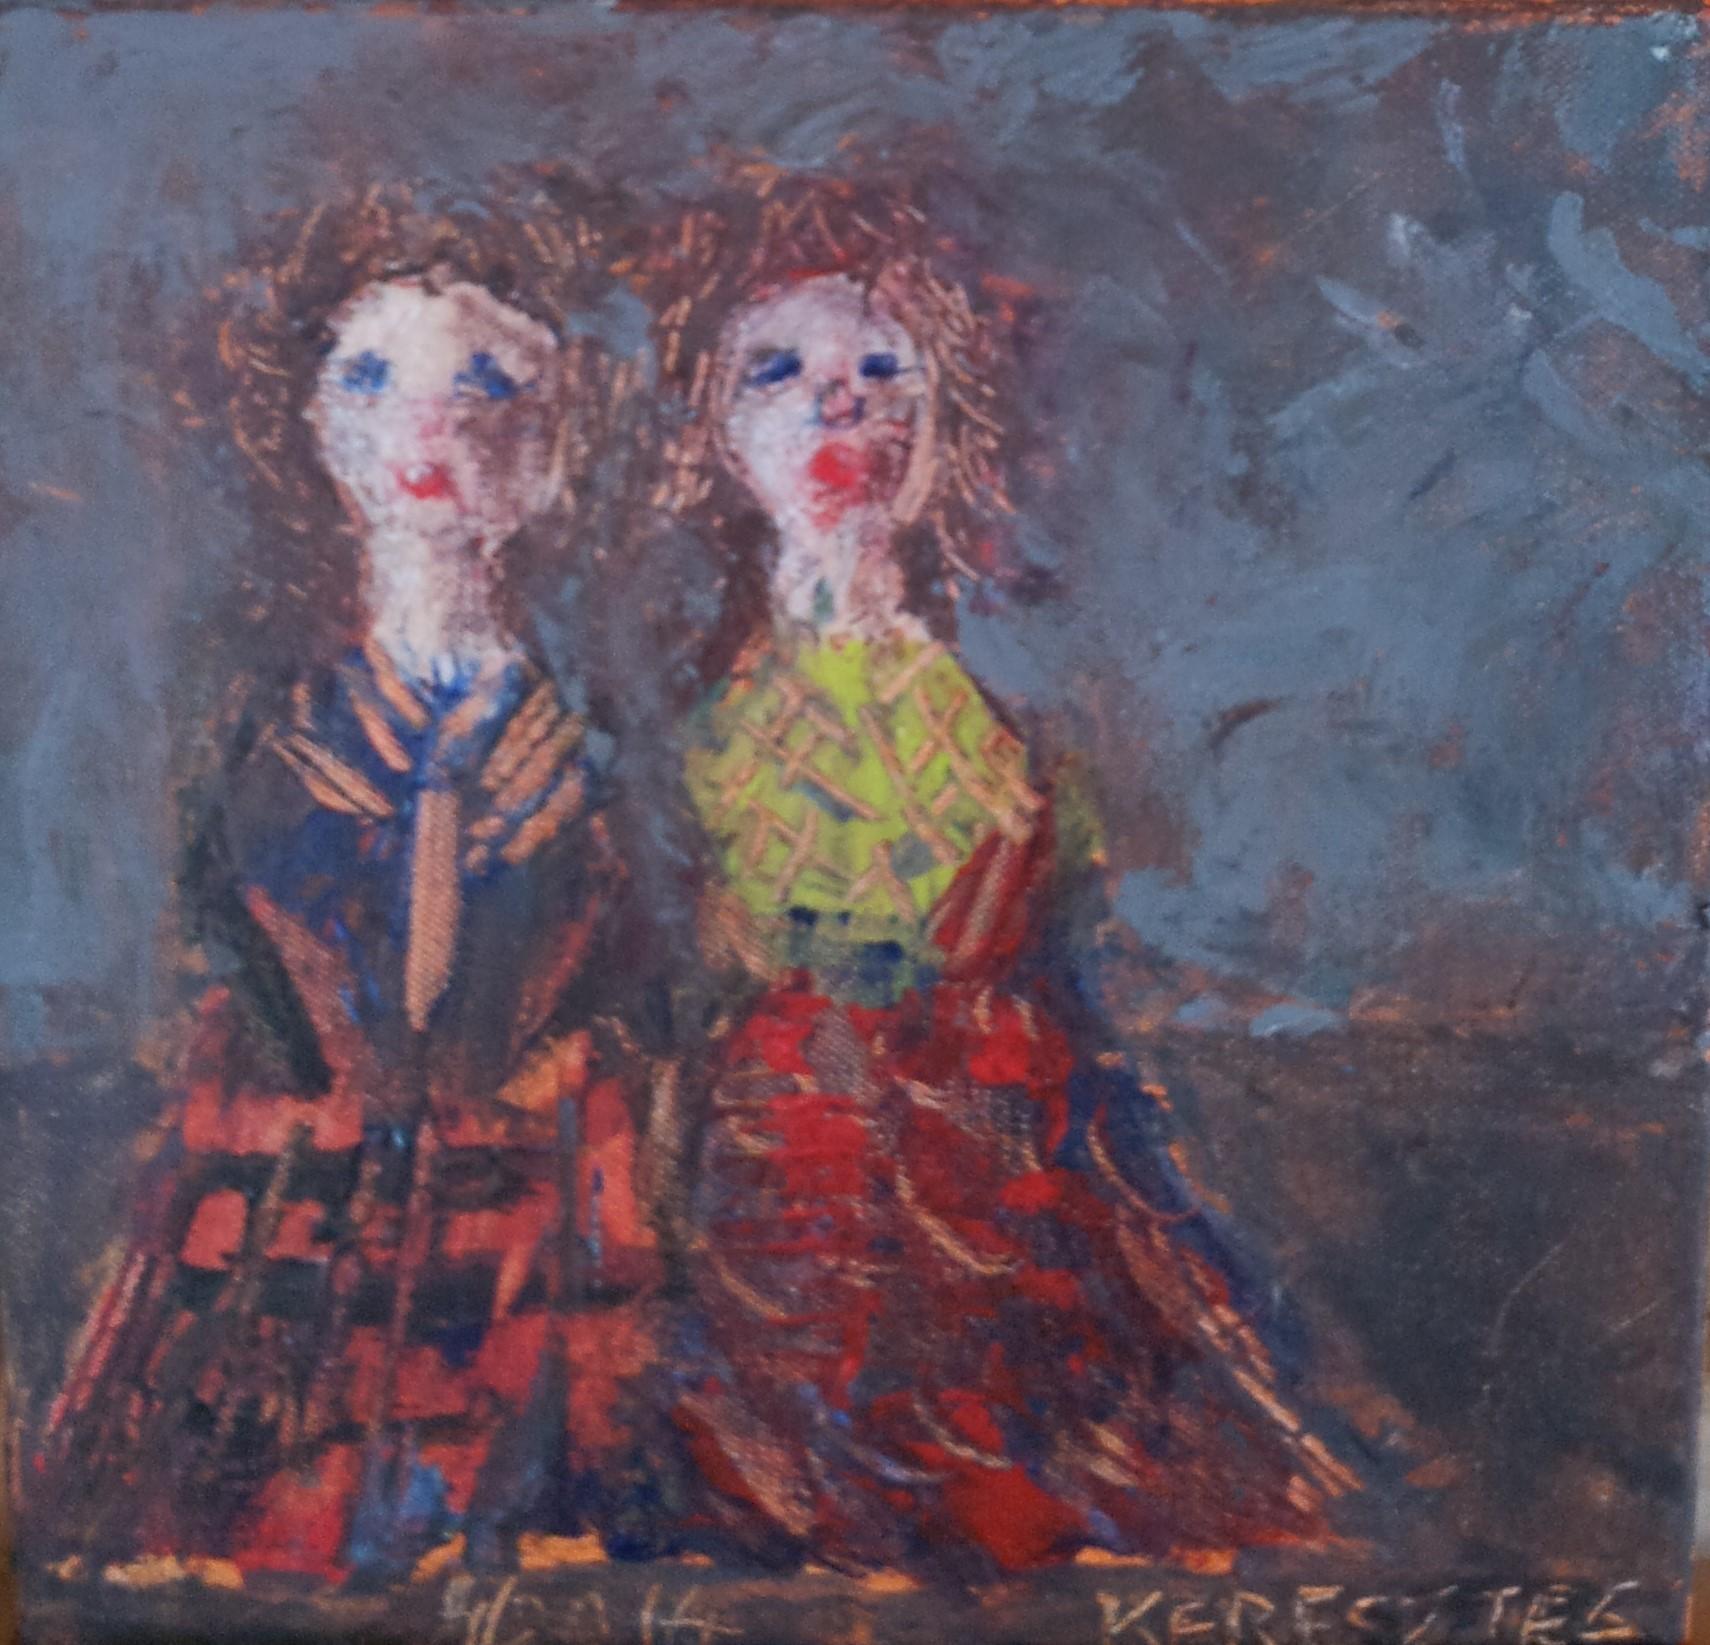 toile 91 - magdalena keresztes, artiste peintre à amiens